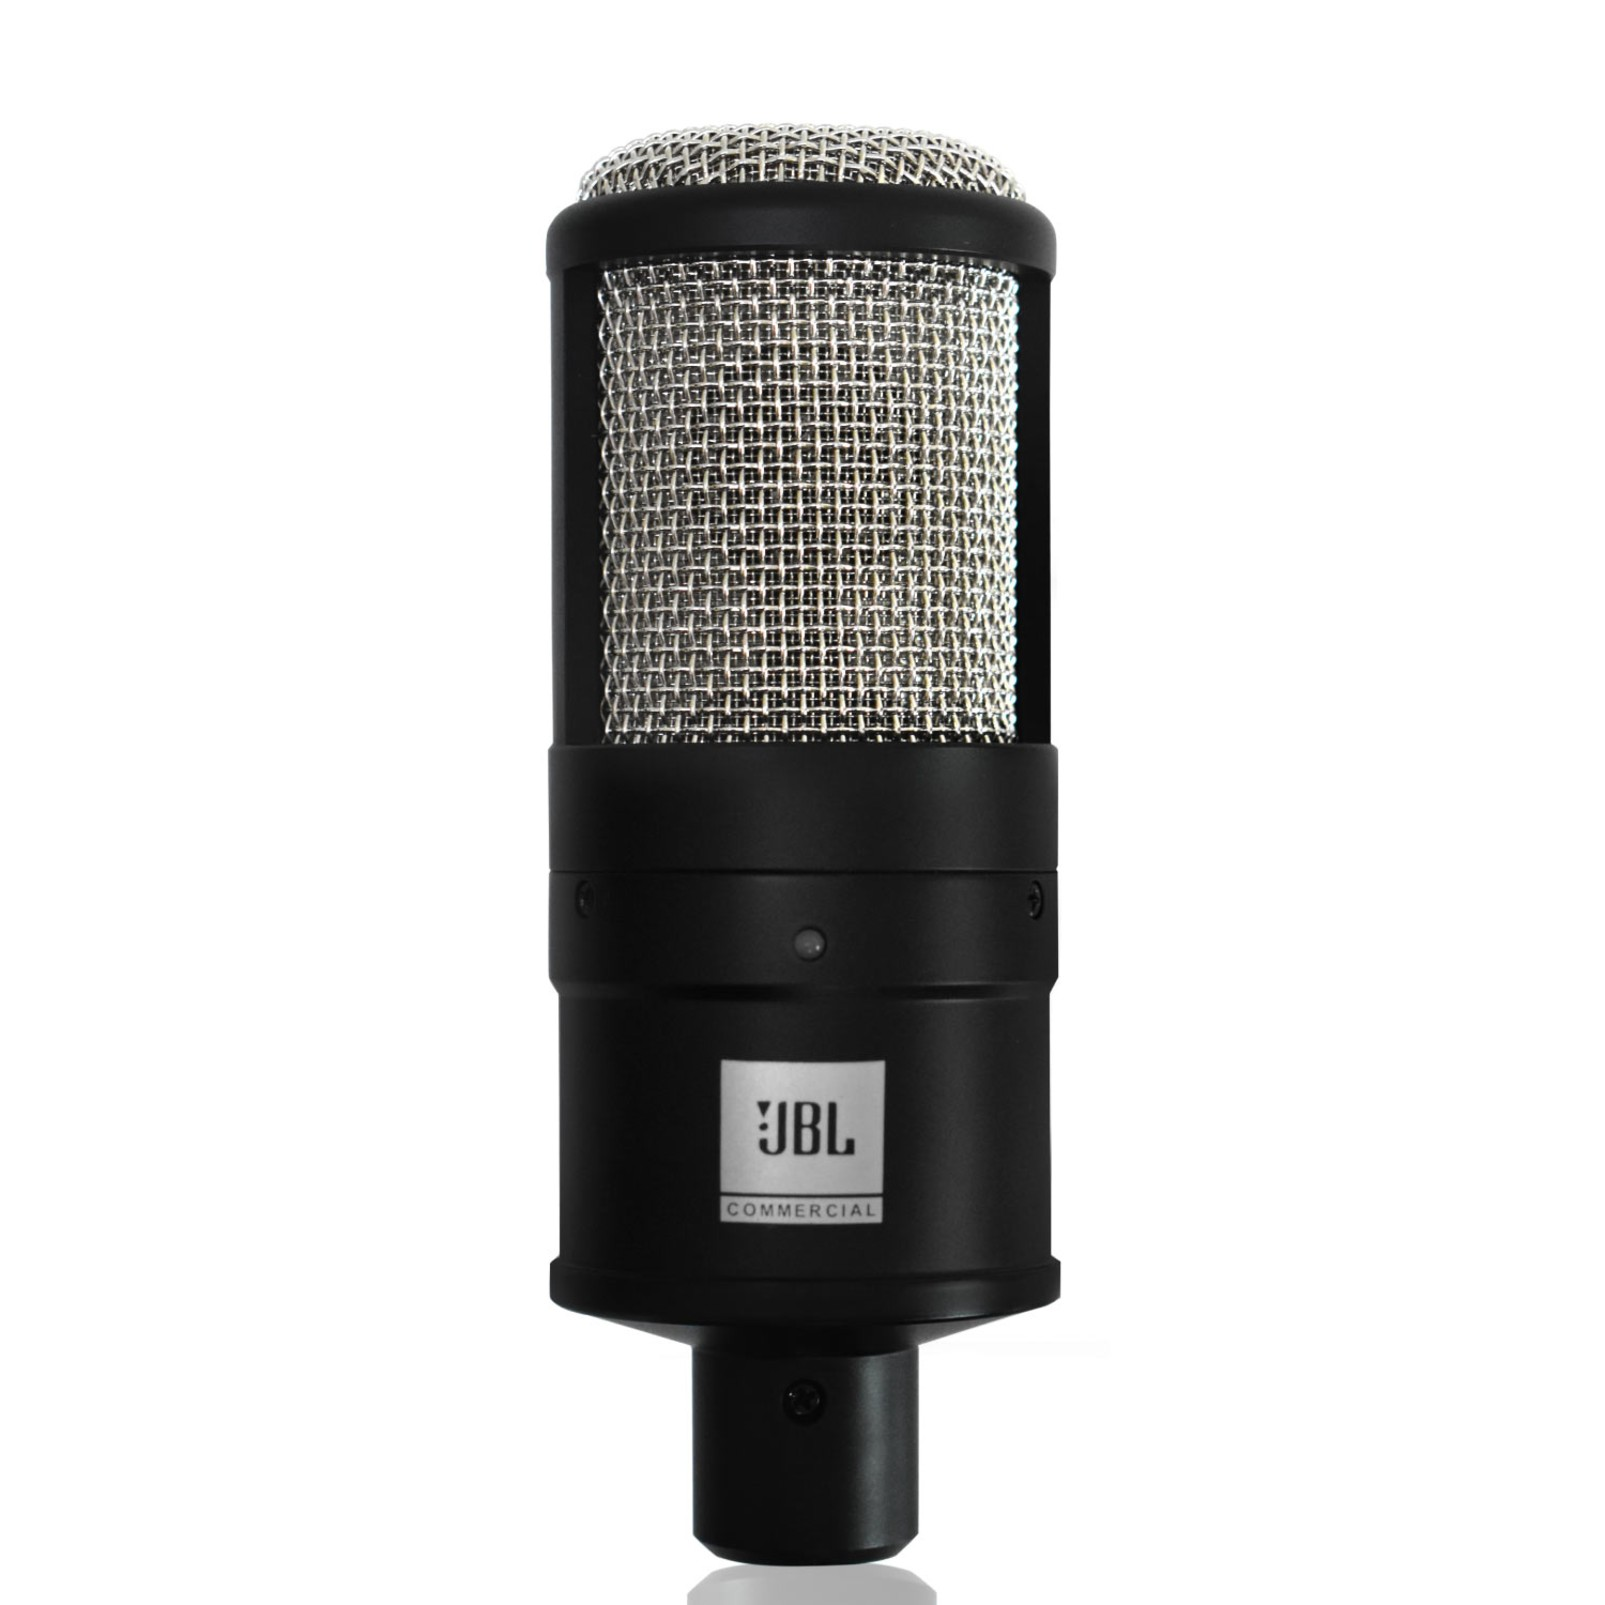 CSSM100 - Black - Studio Condenser Microphone - Hero